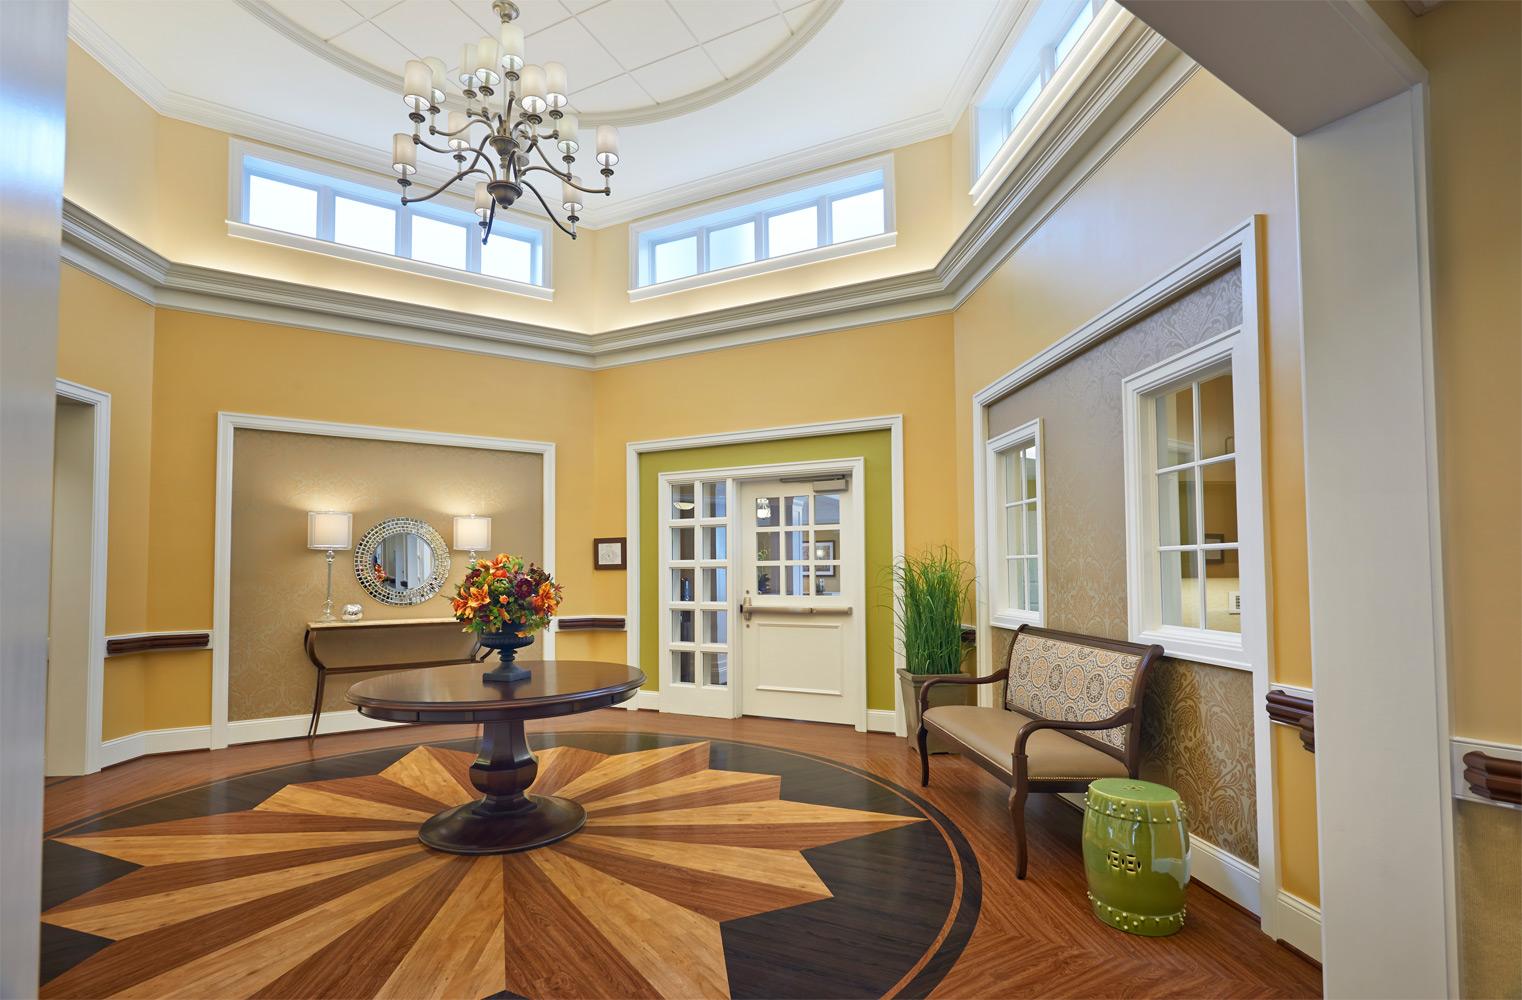 Brandermill Woods Skilled Care Living Room Image